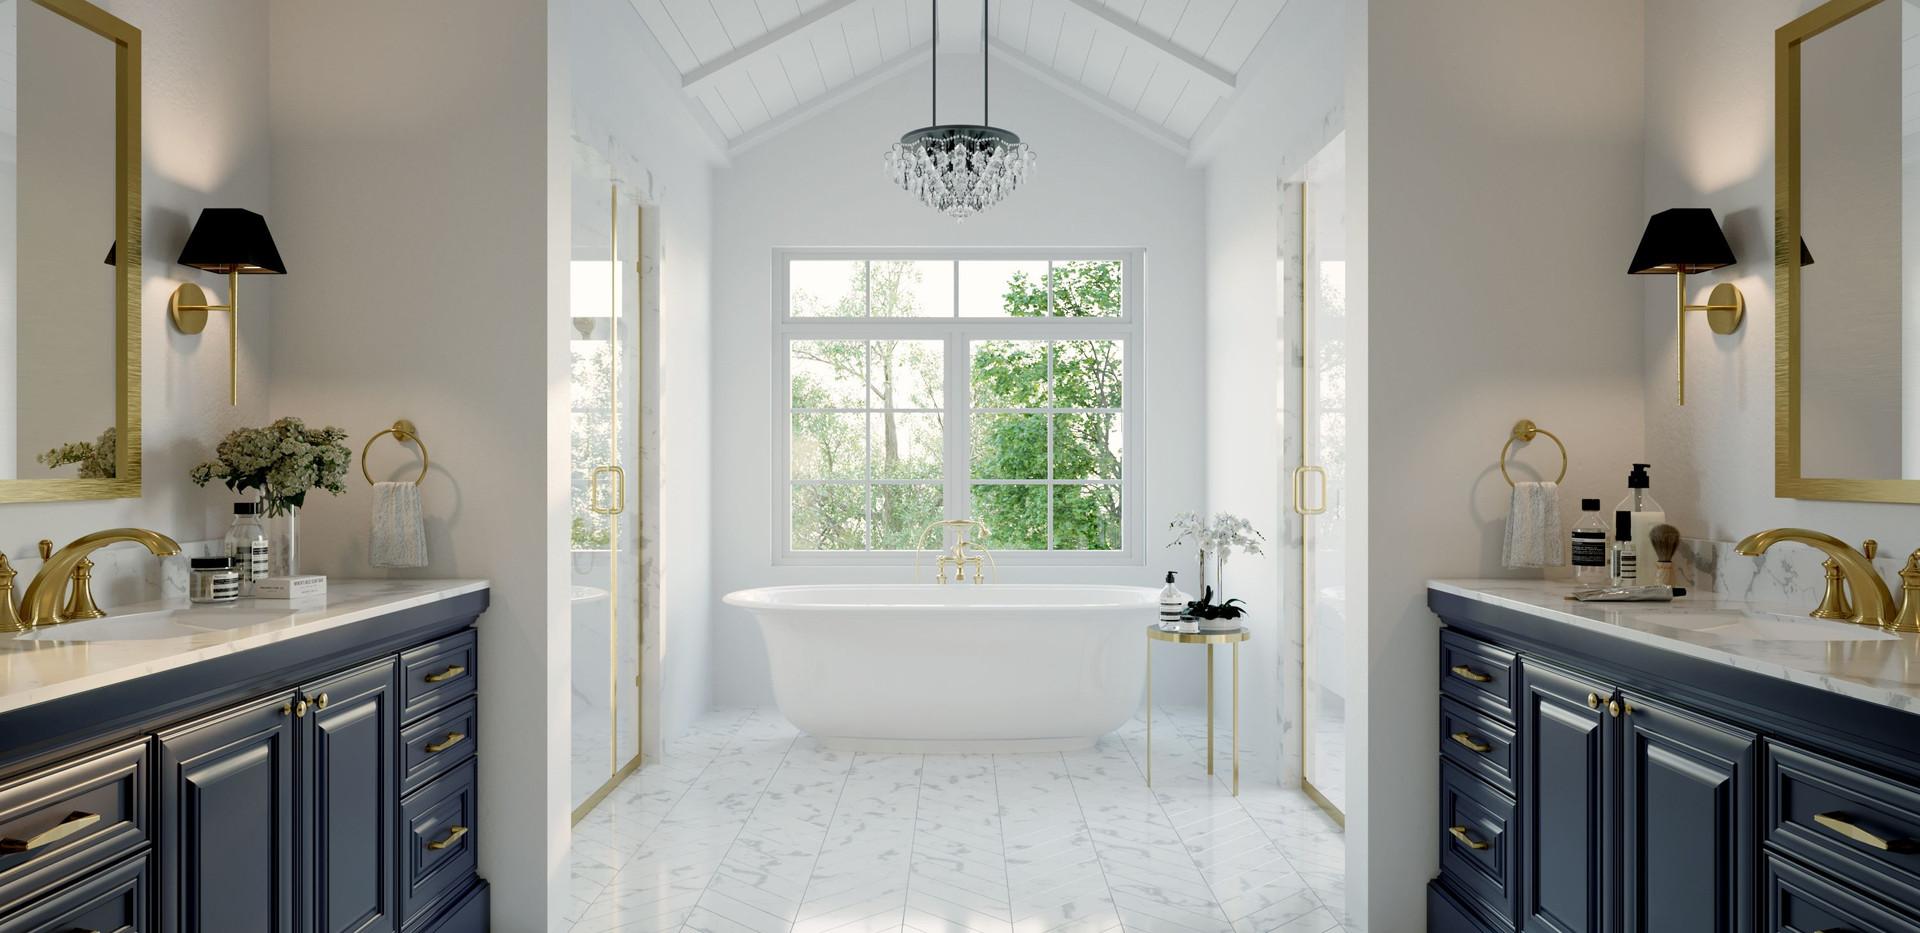 2540 N Ridgeview Rd Master Bath Renderin